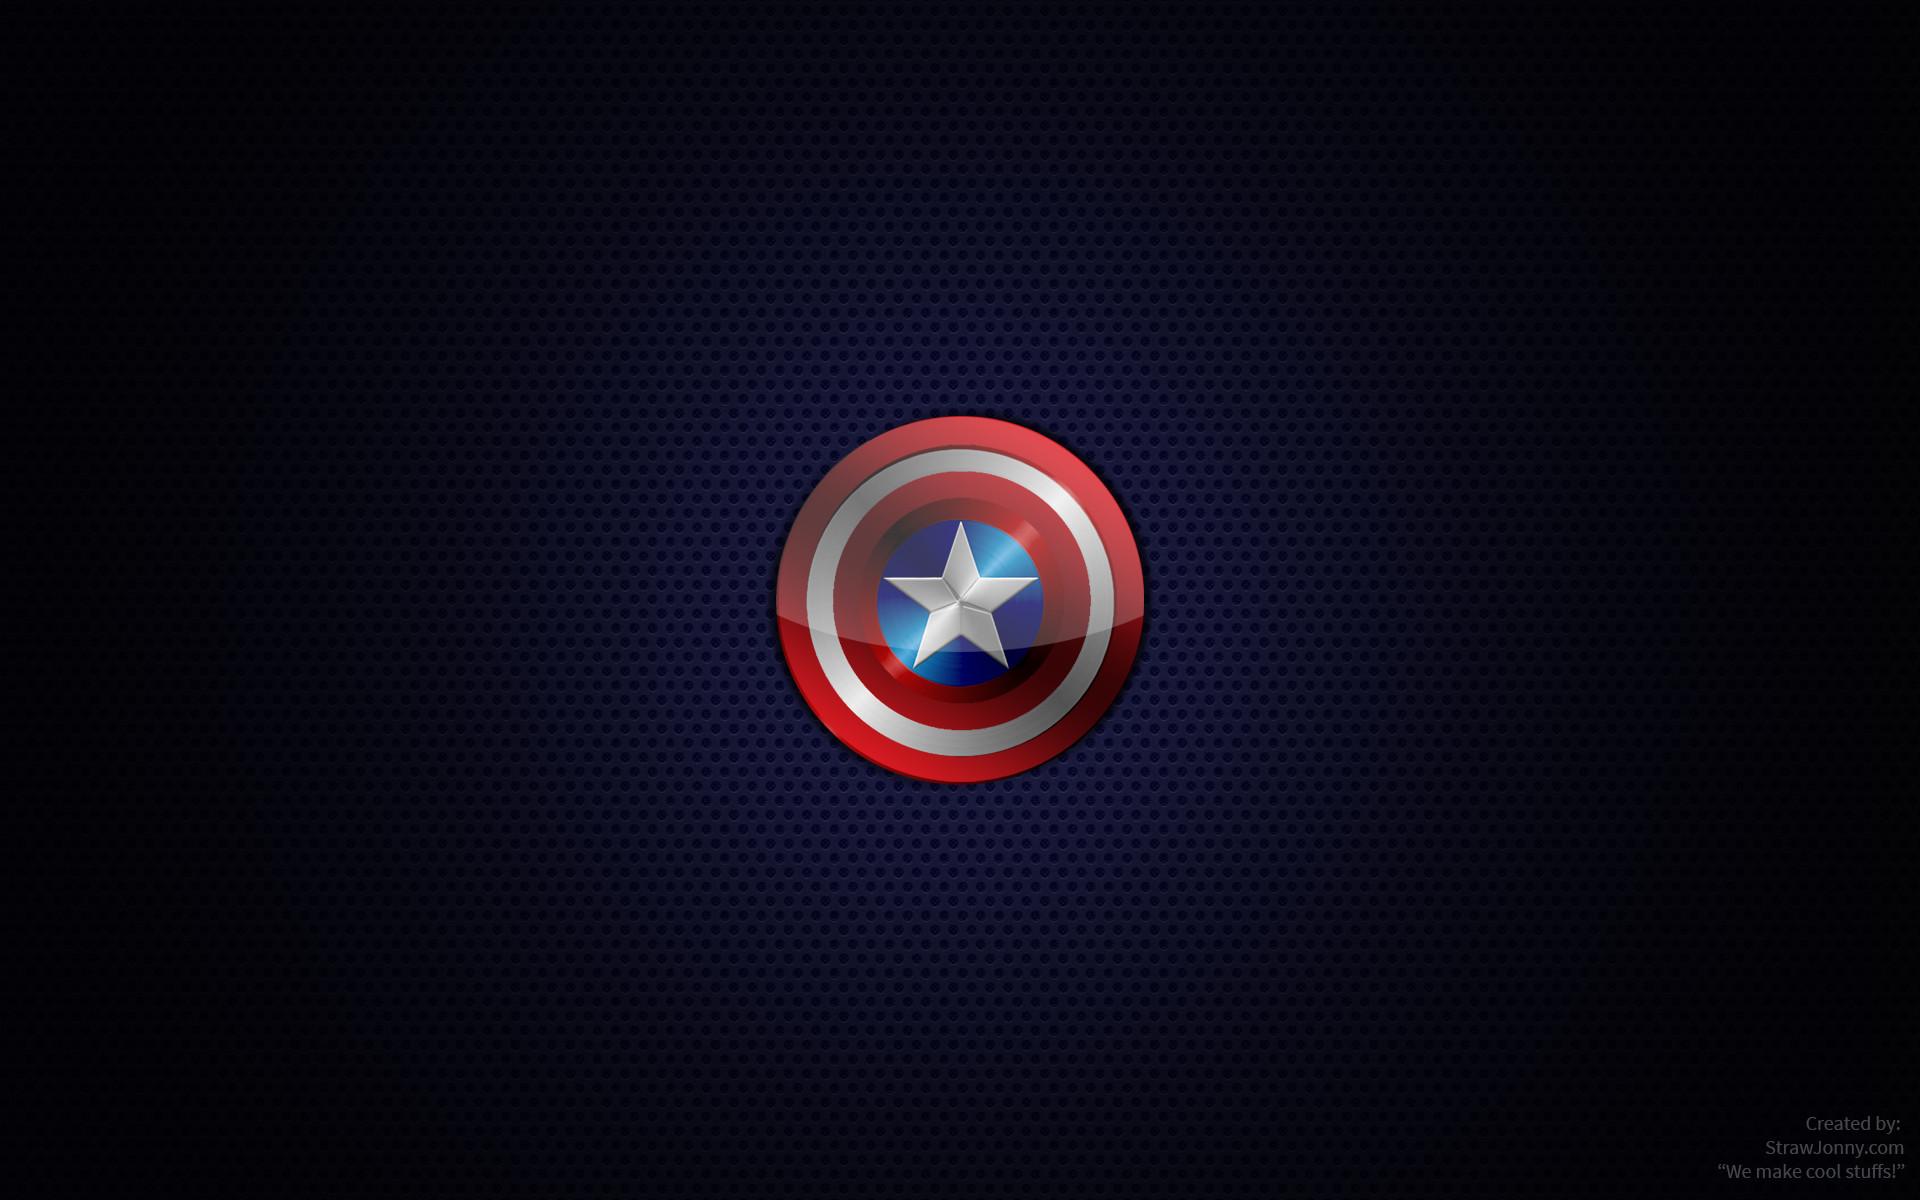 Captain America shield HD Wallpaper | Wallpapers | Pinterest | Captain  america shield and Hd wallpaper